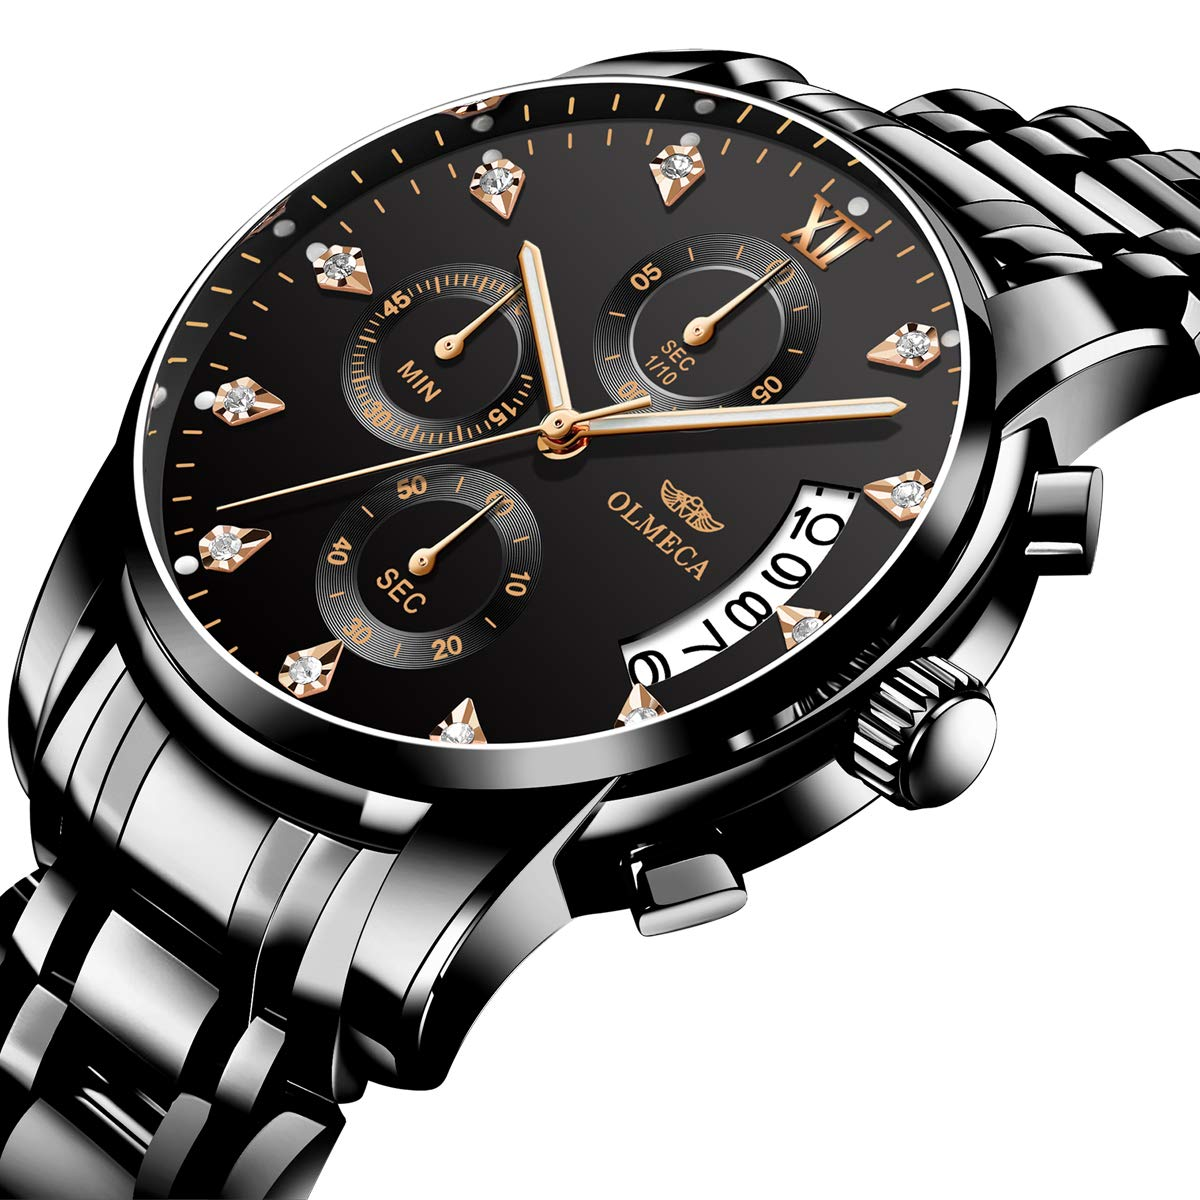 Amazon.com: OLMECA Mens Watches Luxury Wristwatches Rhinestone Watches Waterproof Fashion Quartz Watches Stainless Steel Black Watch (A-Black): Watches